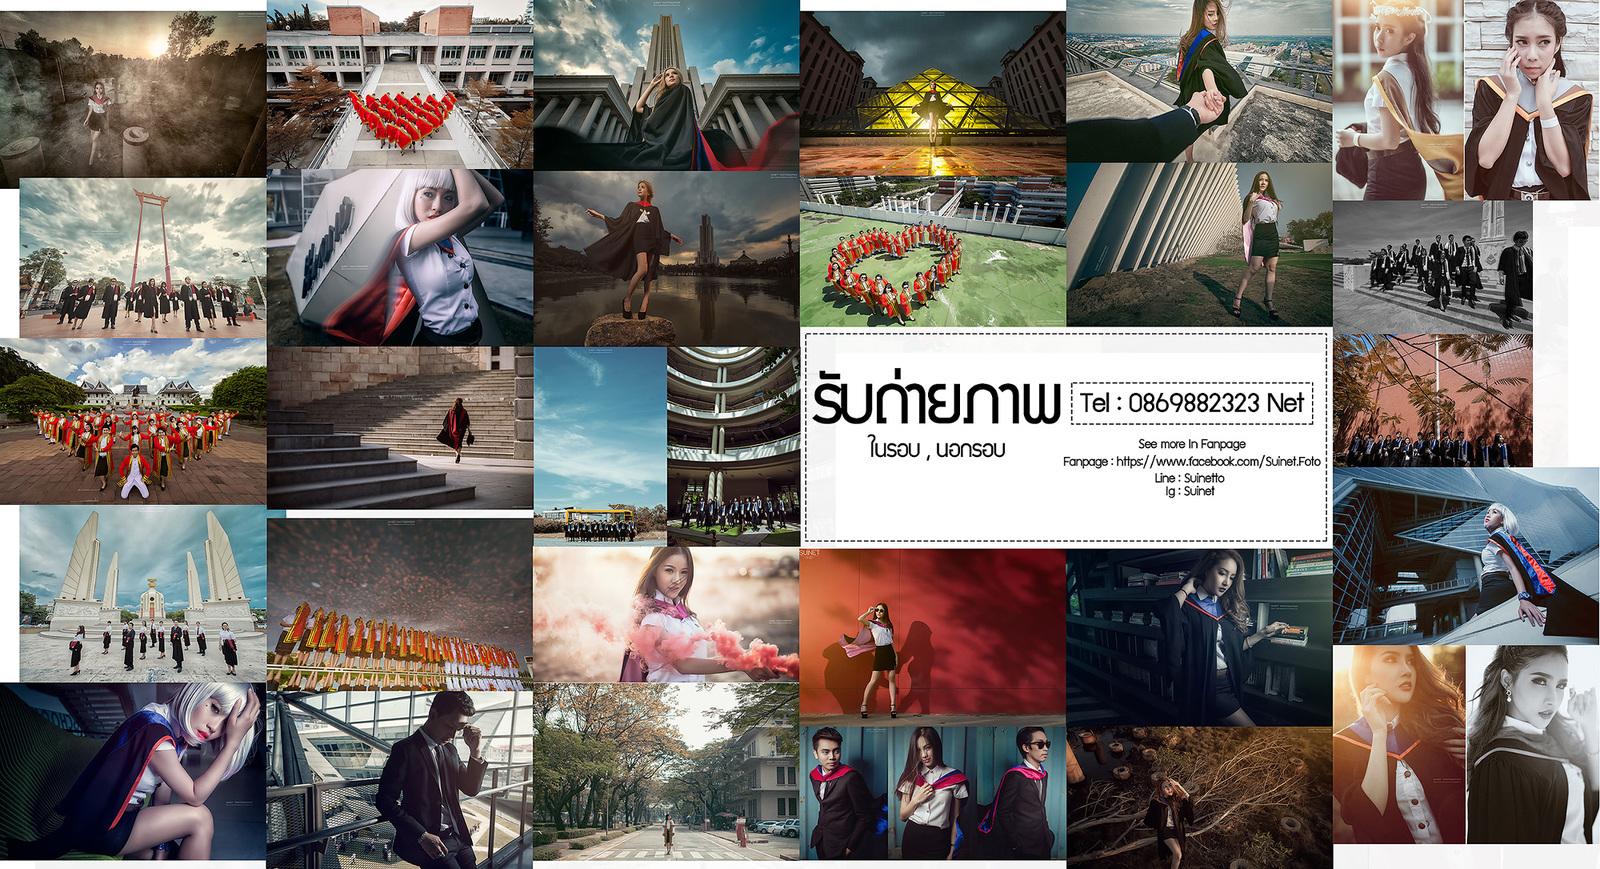 Suinet Photographer